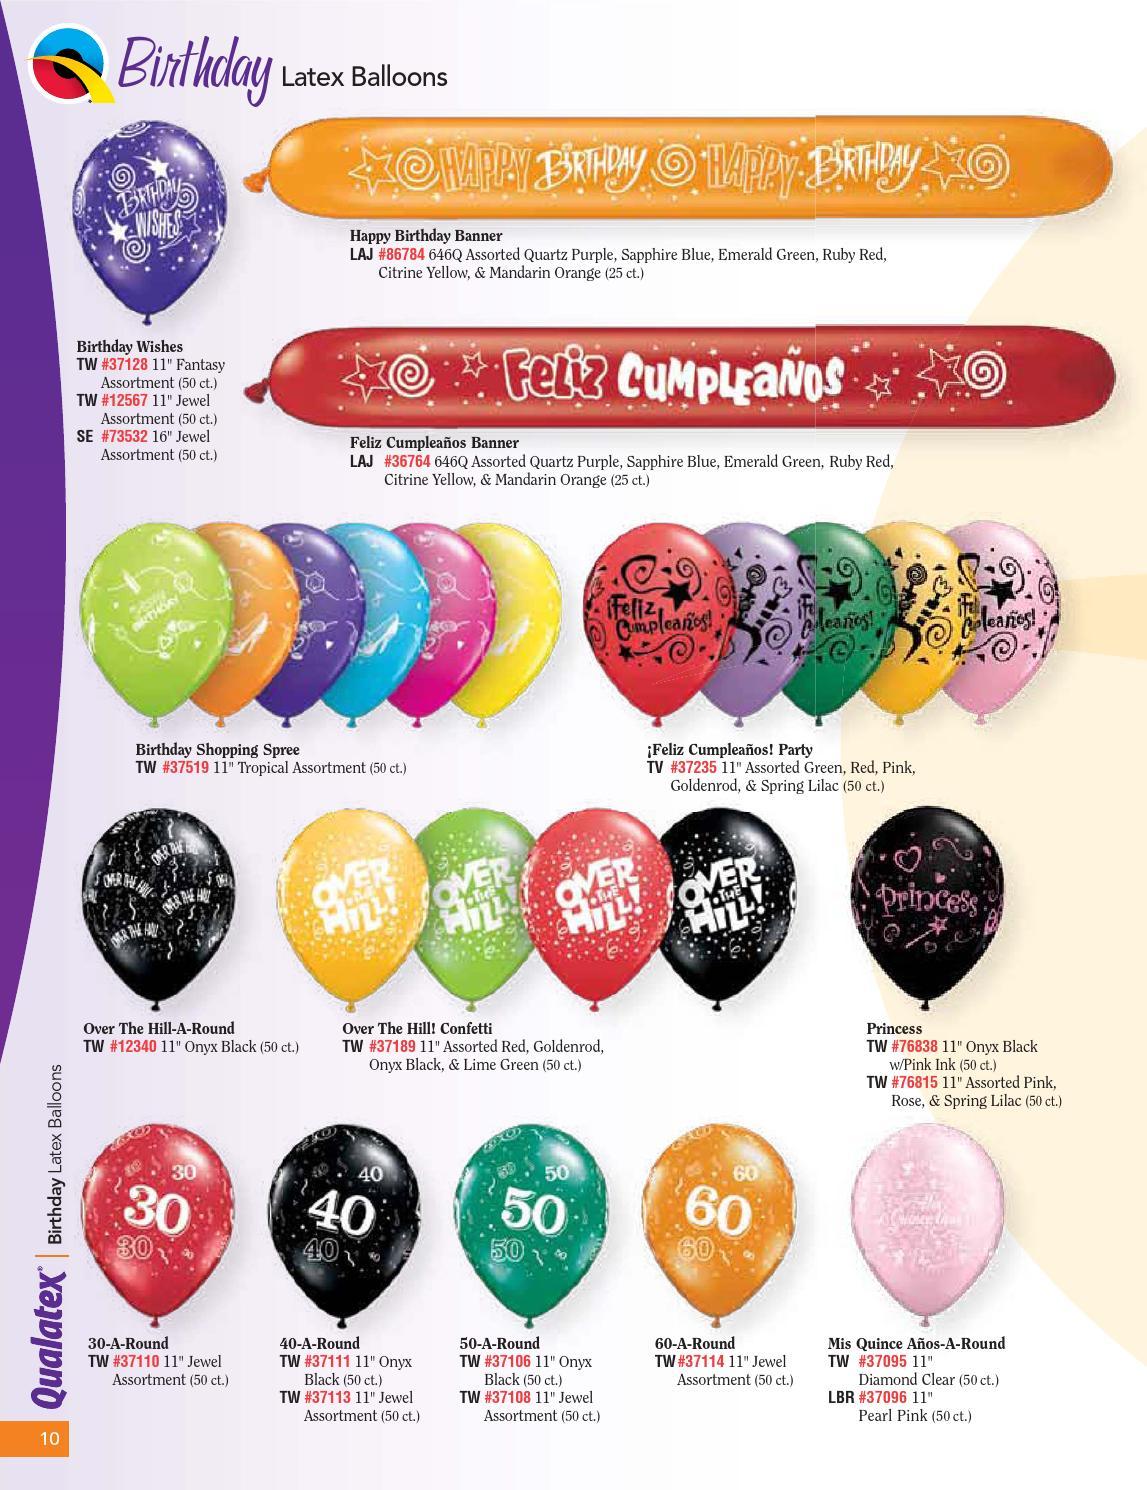 Pioneer Balloon Company 37110 30-A-ROUND JEWEL ASSORTMENT 11,